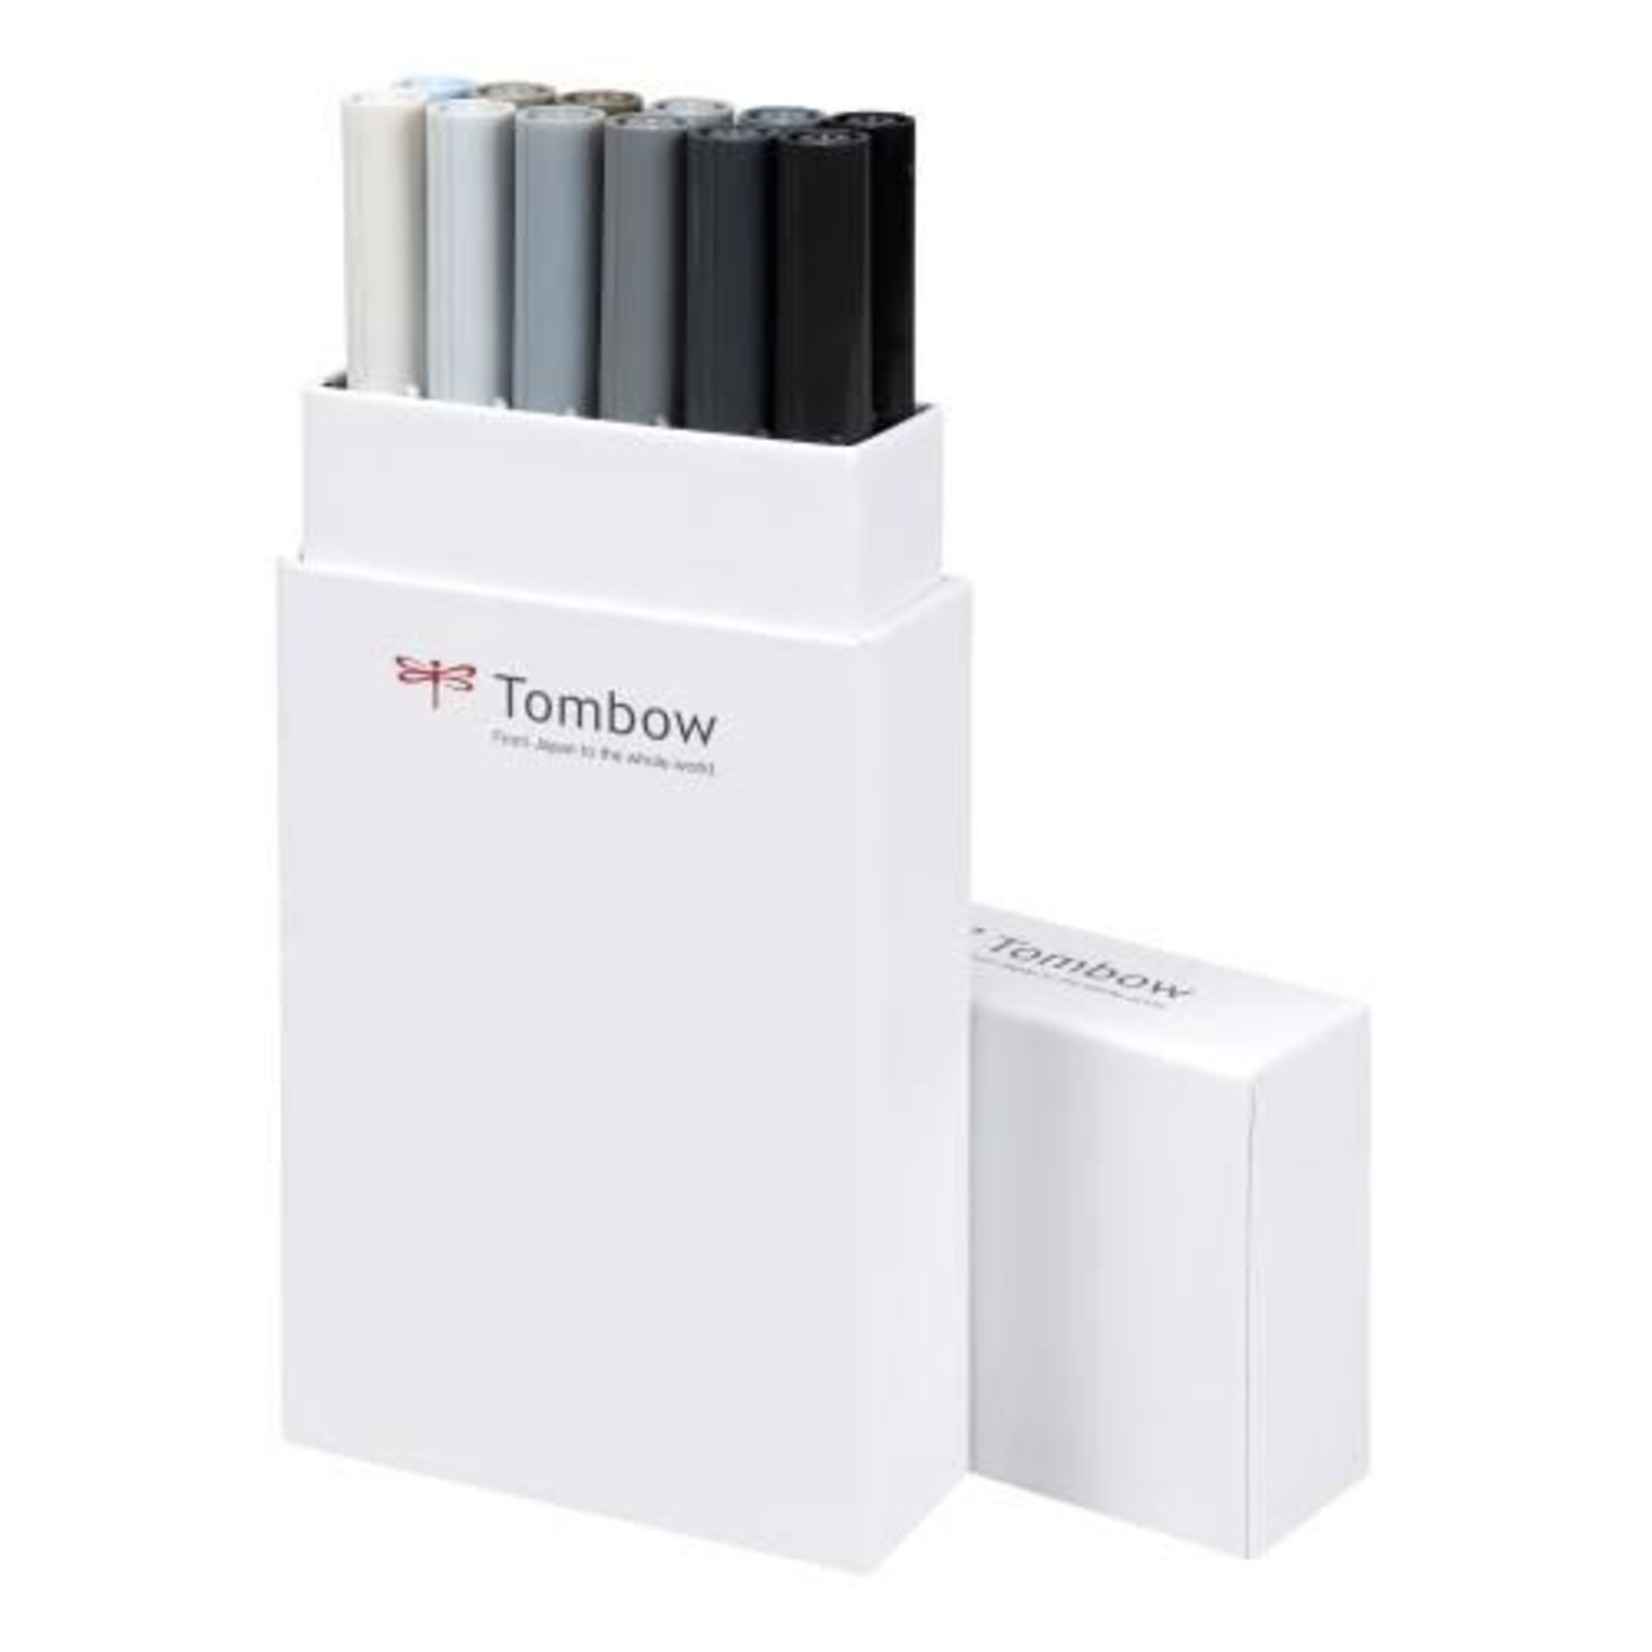 Tombow Dual Brush Pen 12er-Set  Grautöne